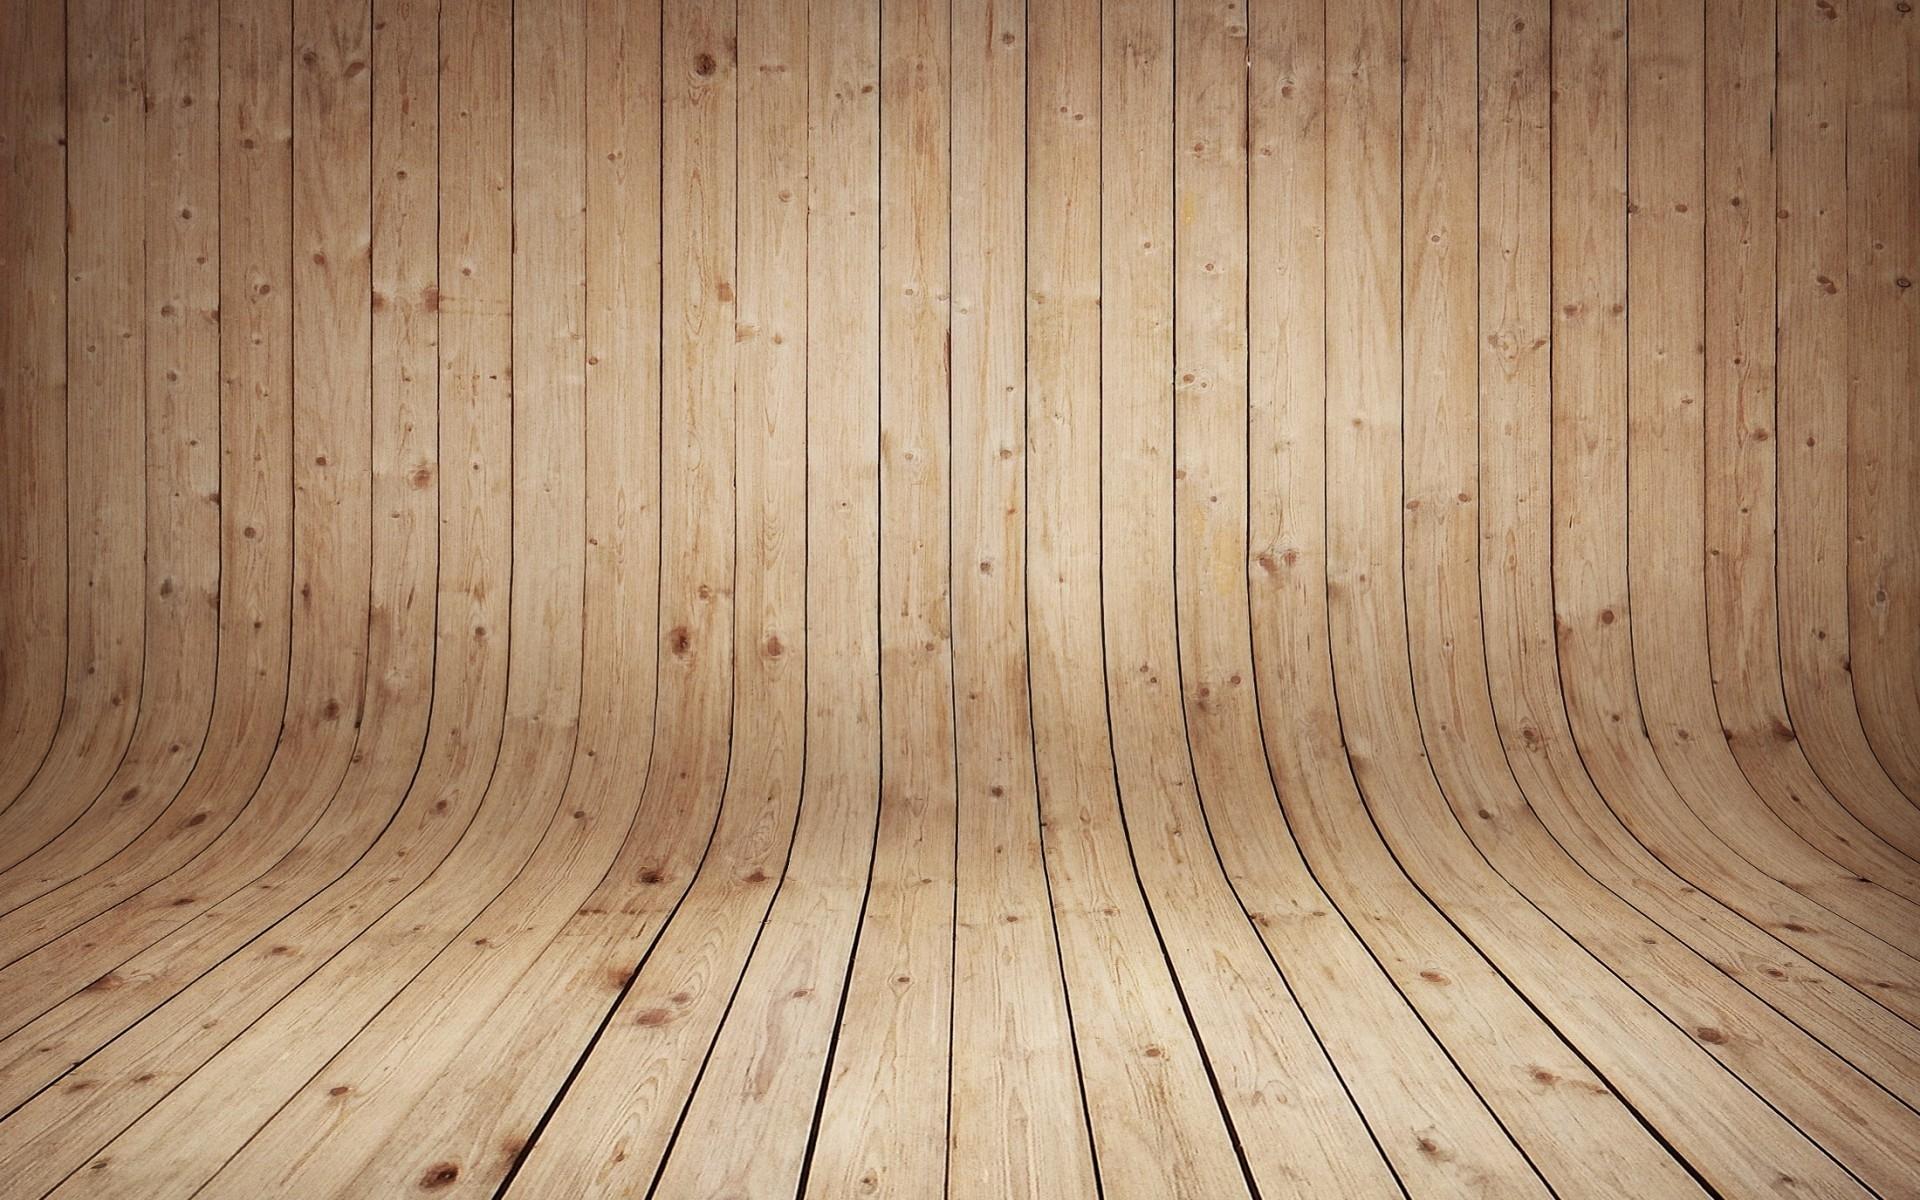 Wood Wallpaper - Best HD Wallpaper